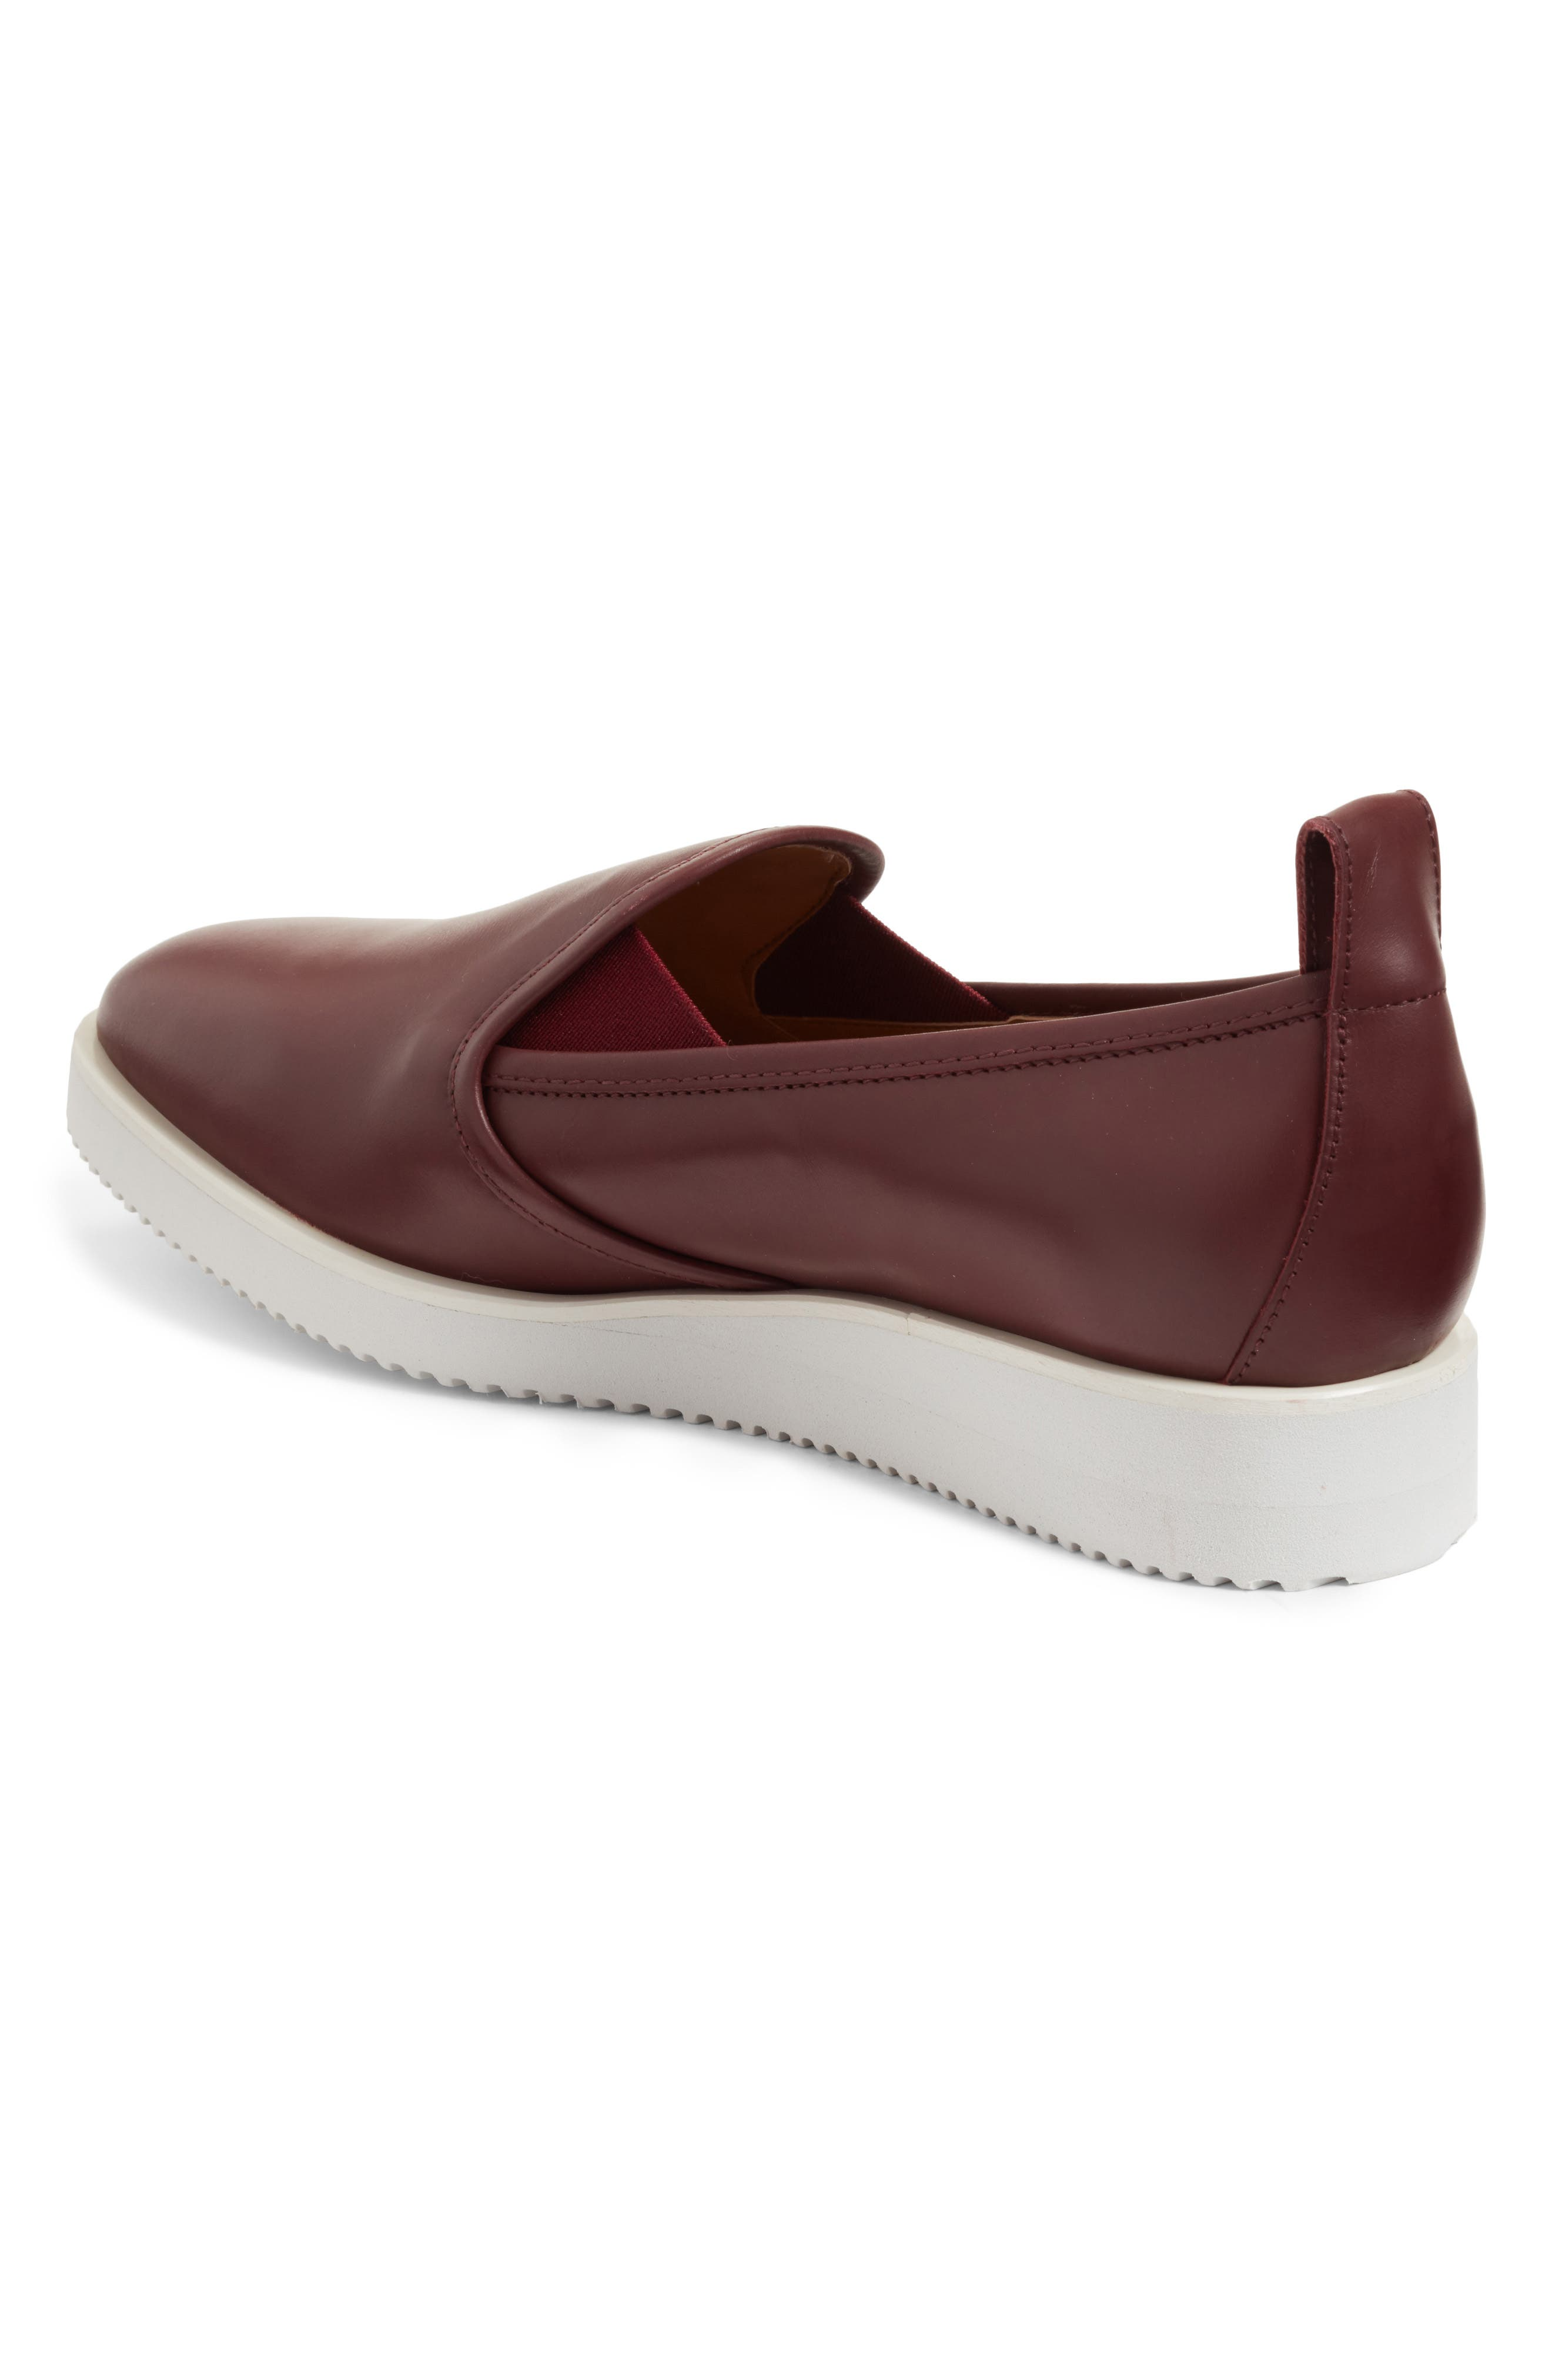 Alternate Image 2  - Everlane The Leather Street Shoe (Women)